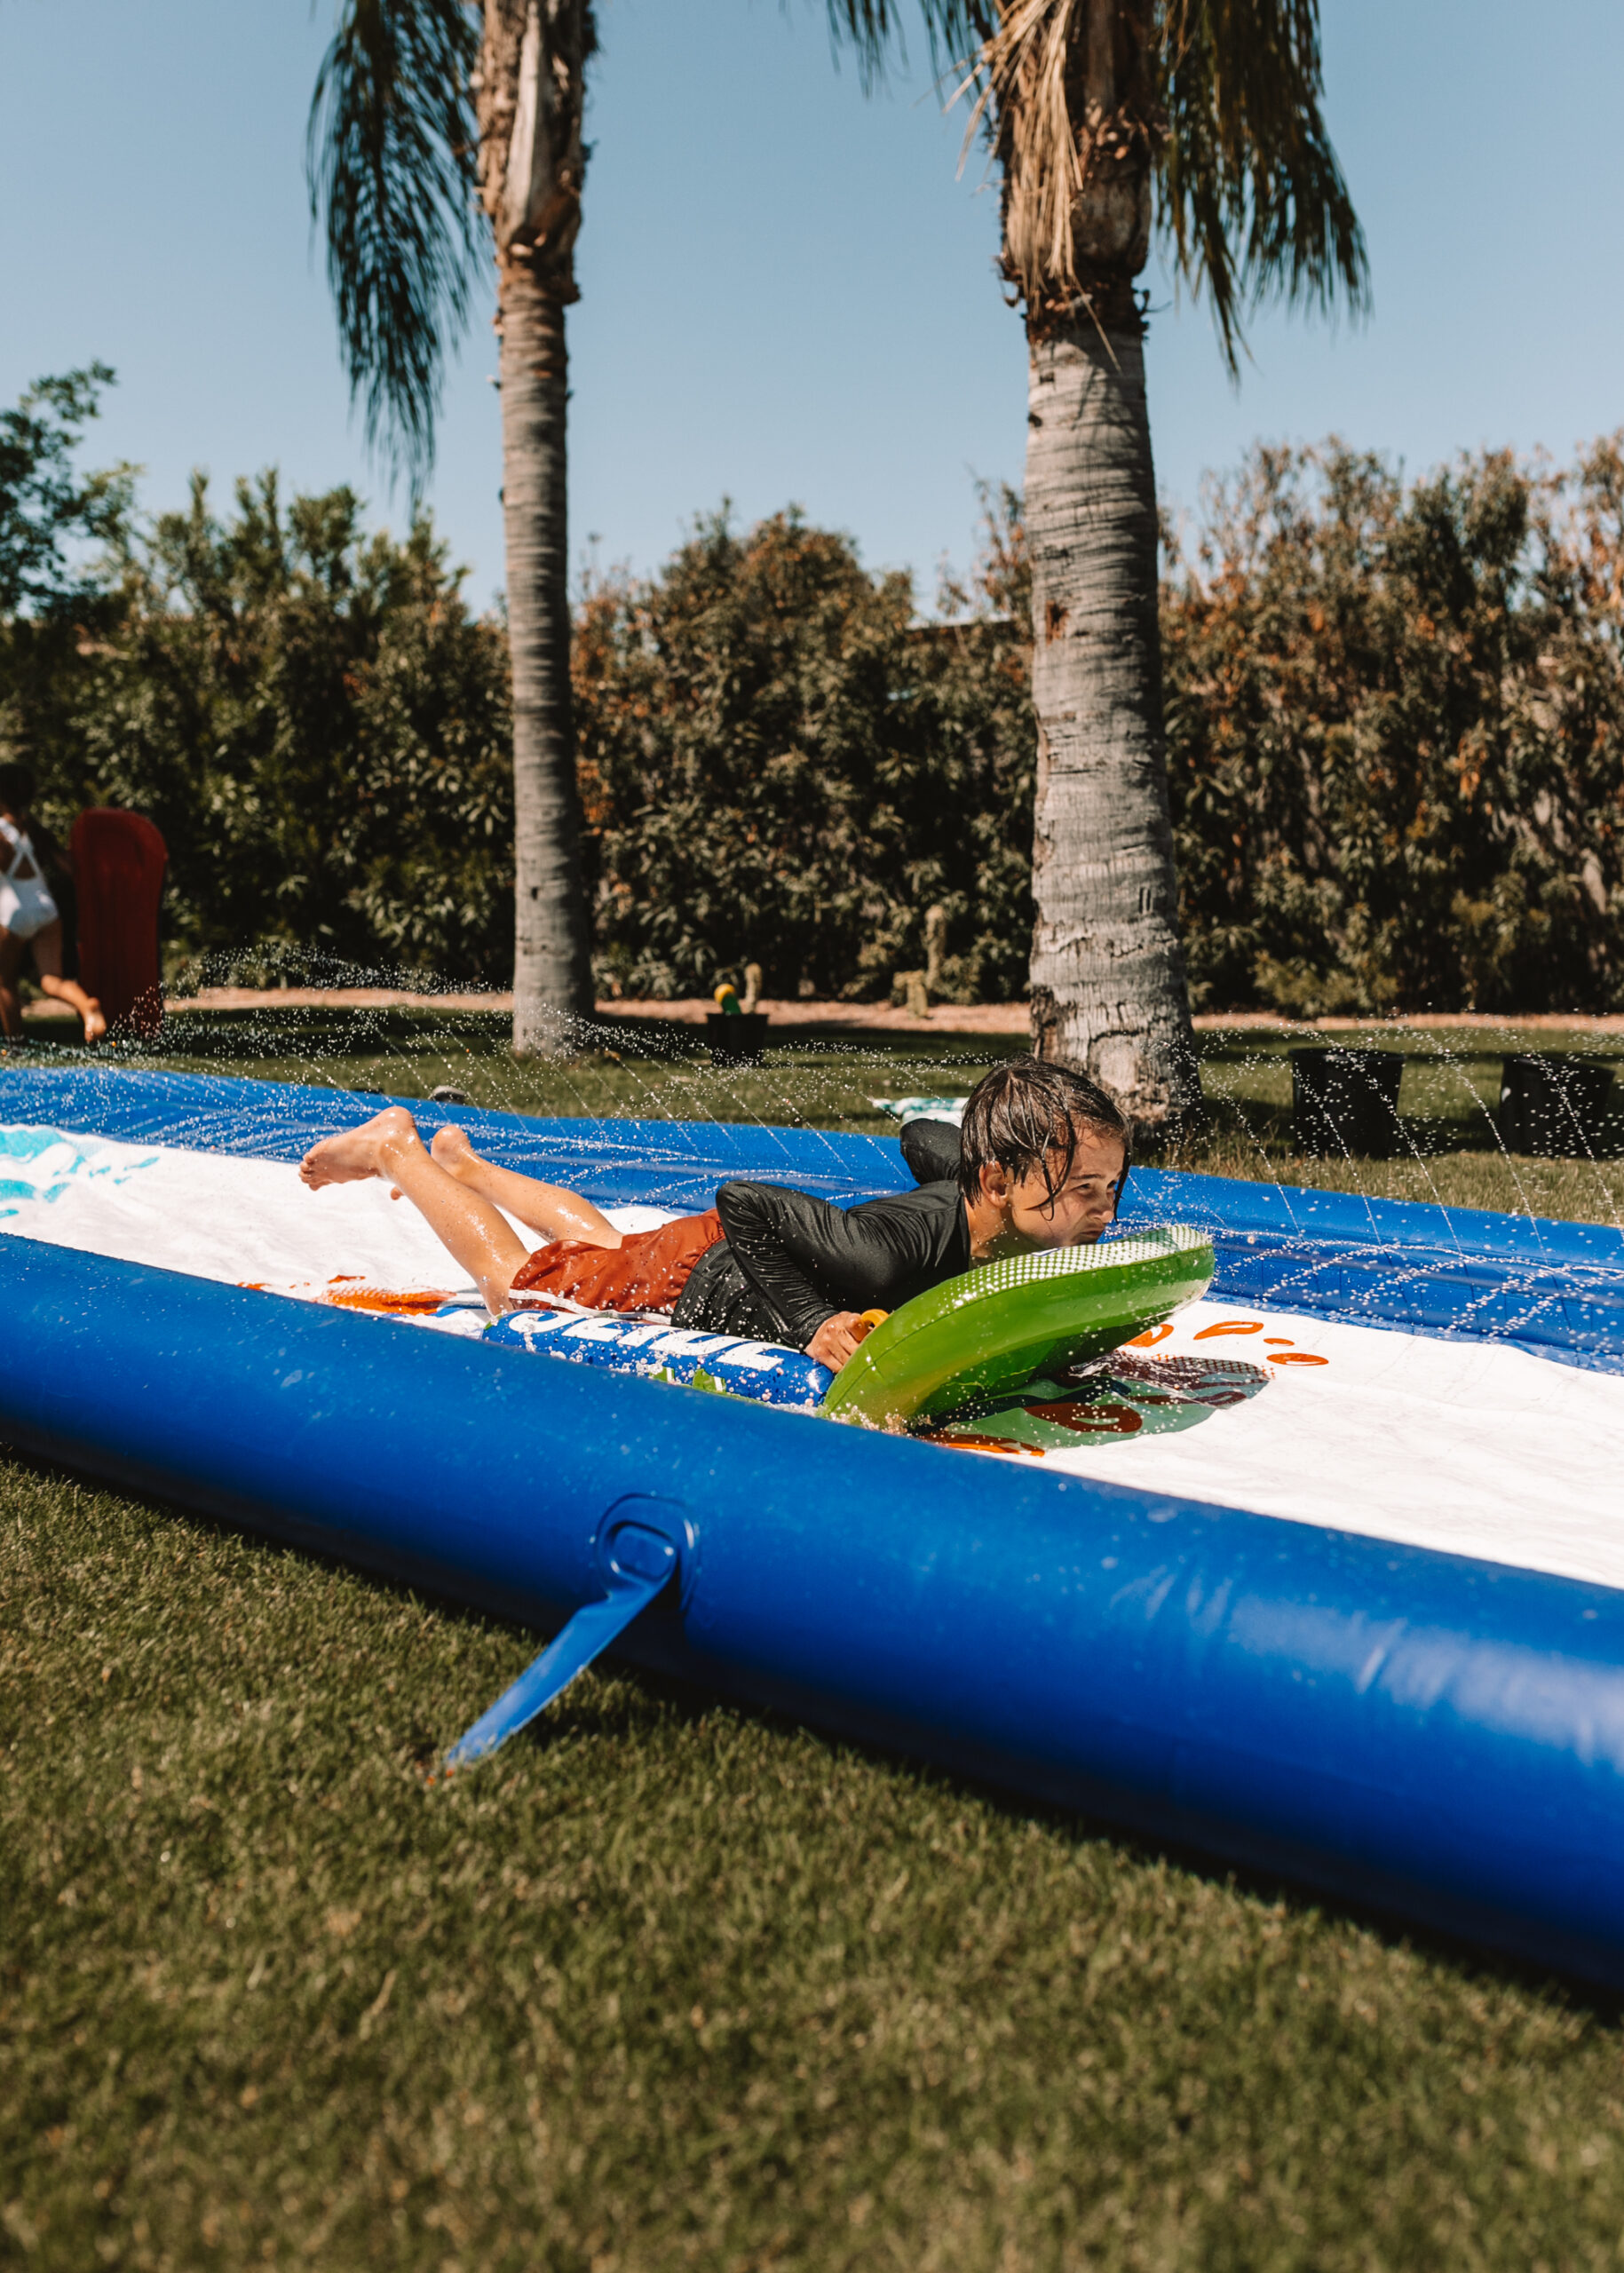 slip and slide water fun for our backyard field day! #slipandslide #backyardfun